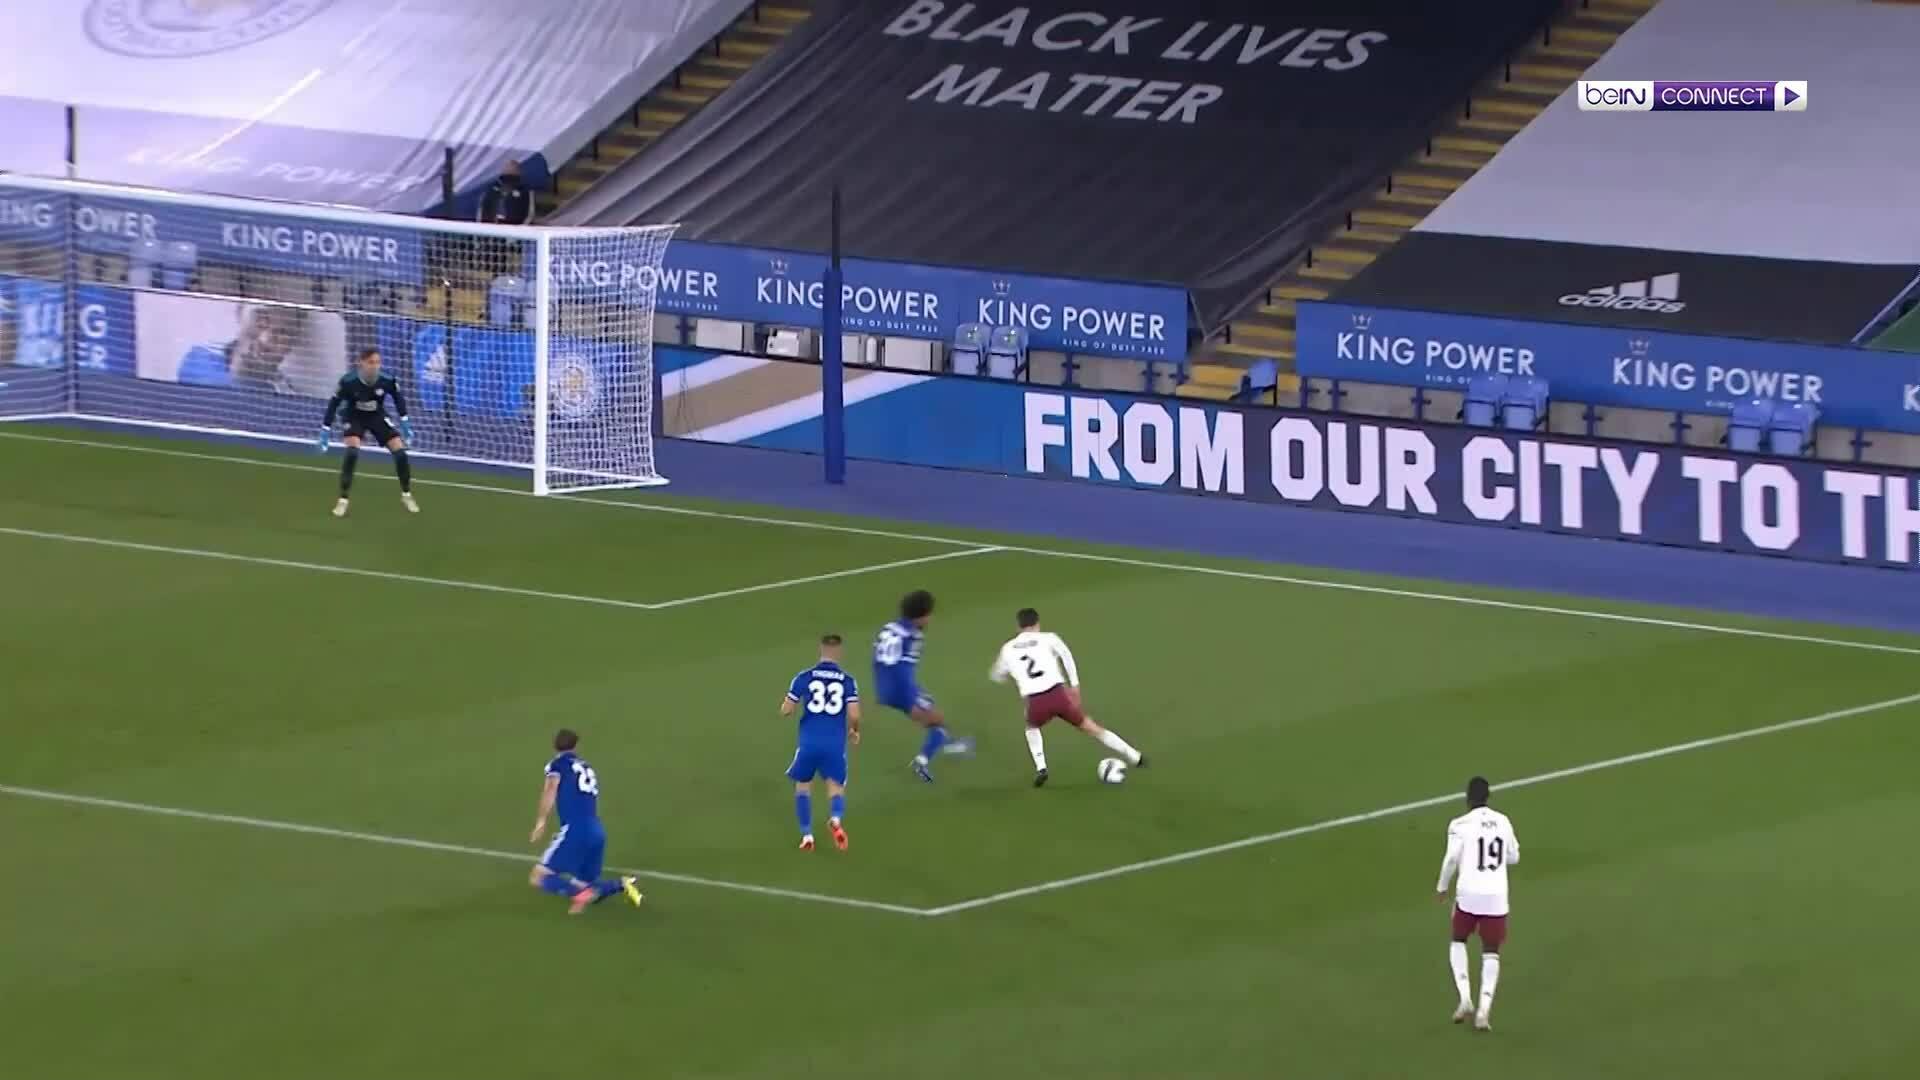 Leicester 0-2 Arsenal